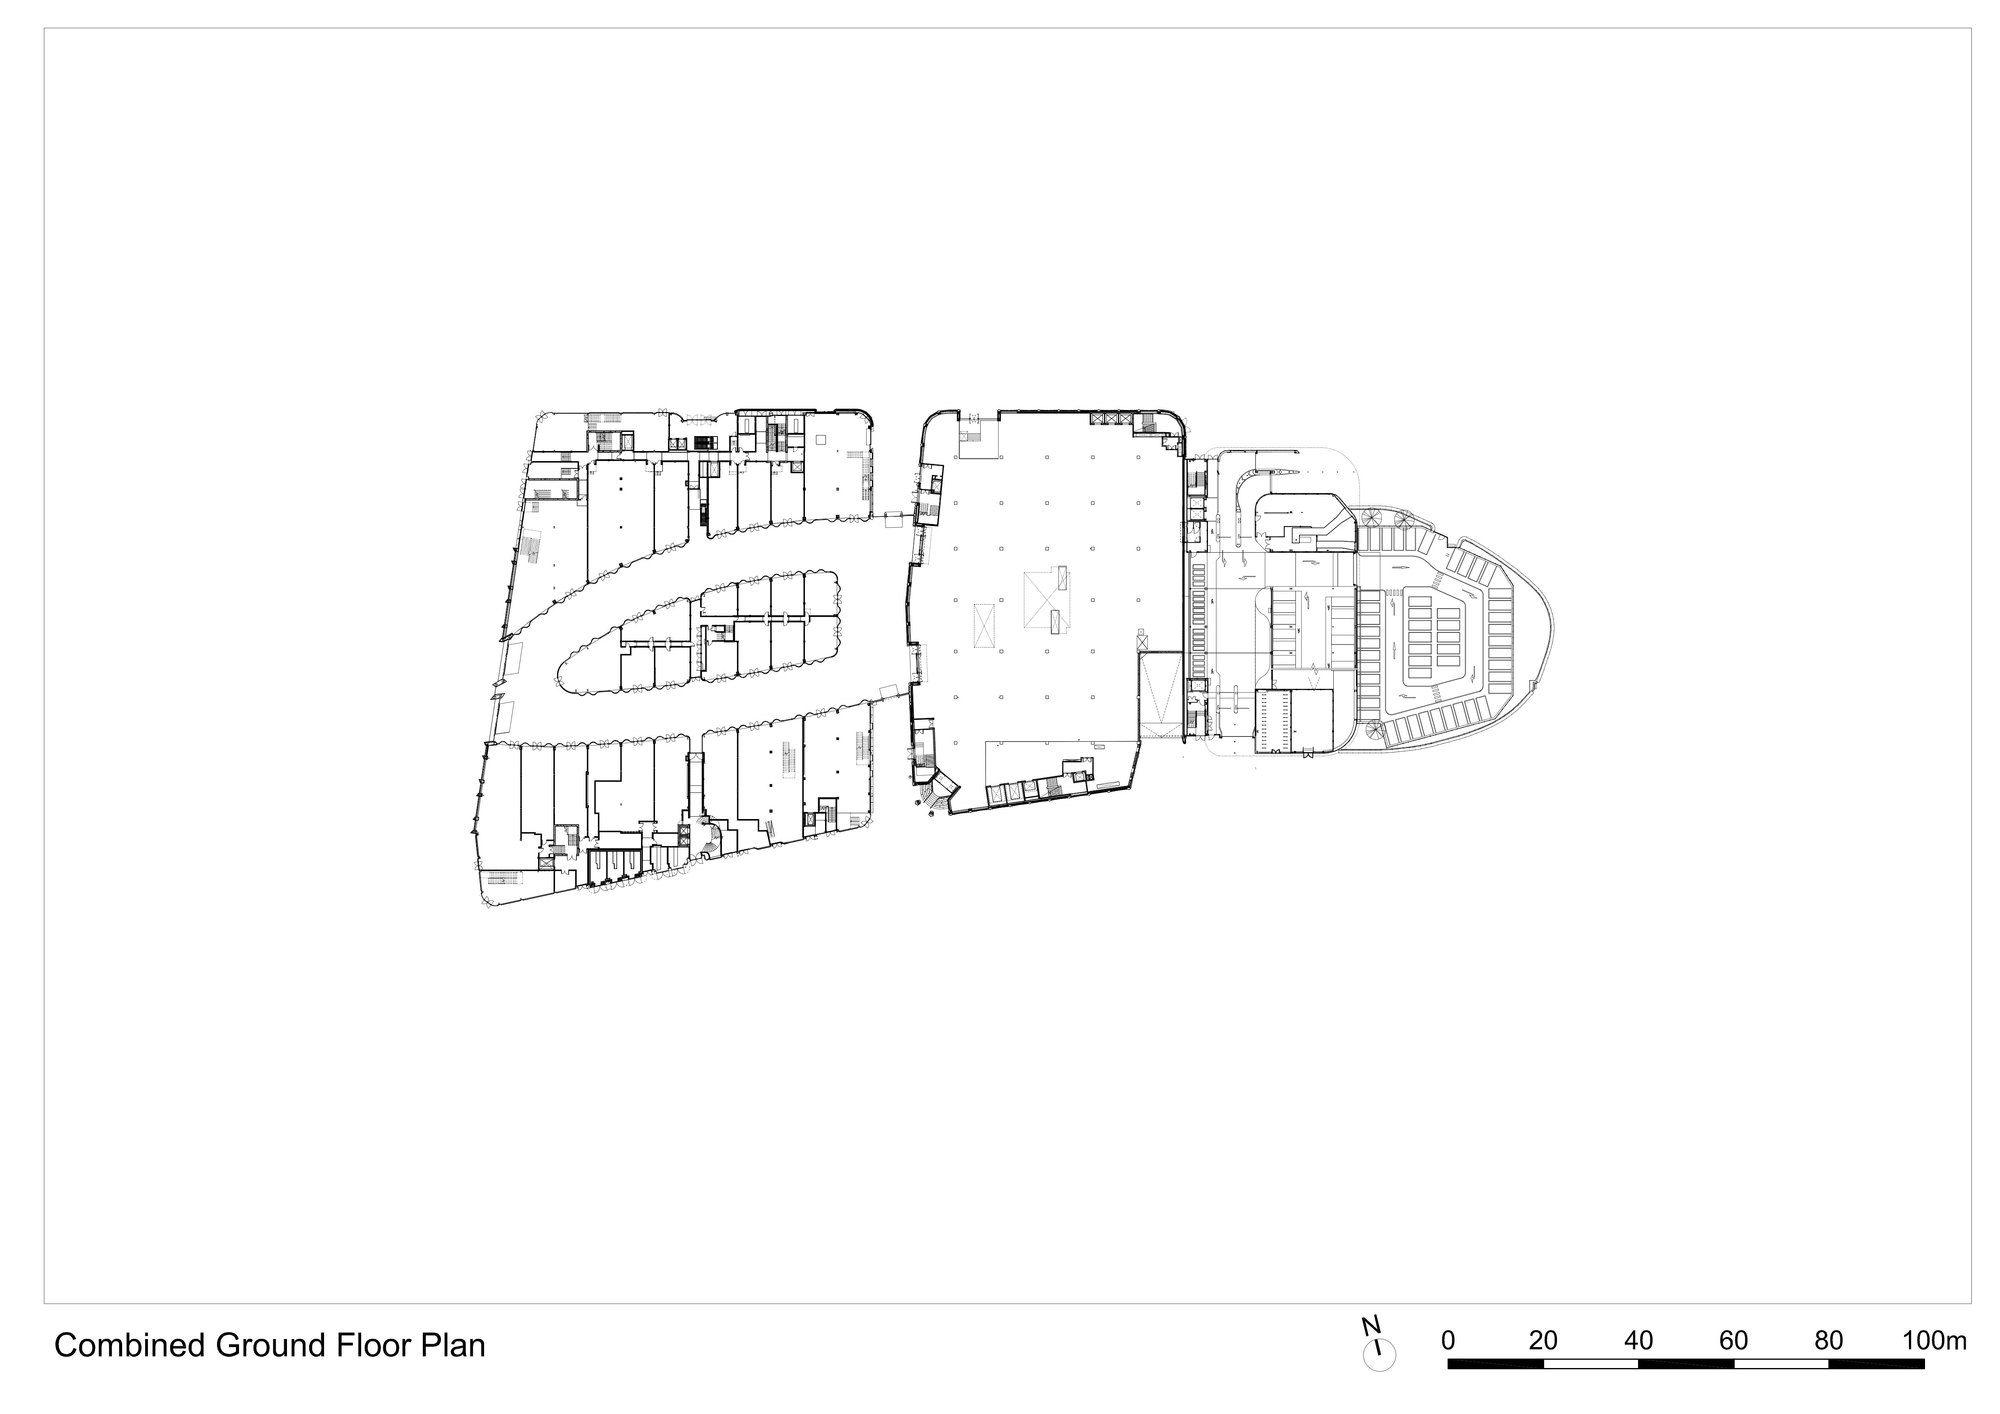 Image 43 of 81. 整合的一层平面图